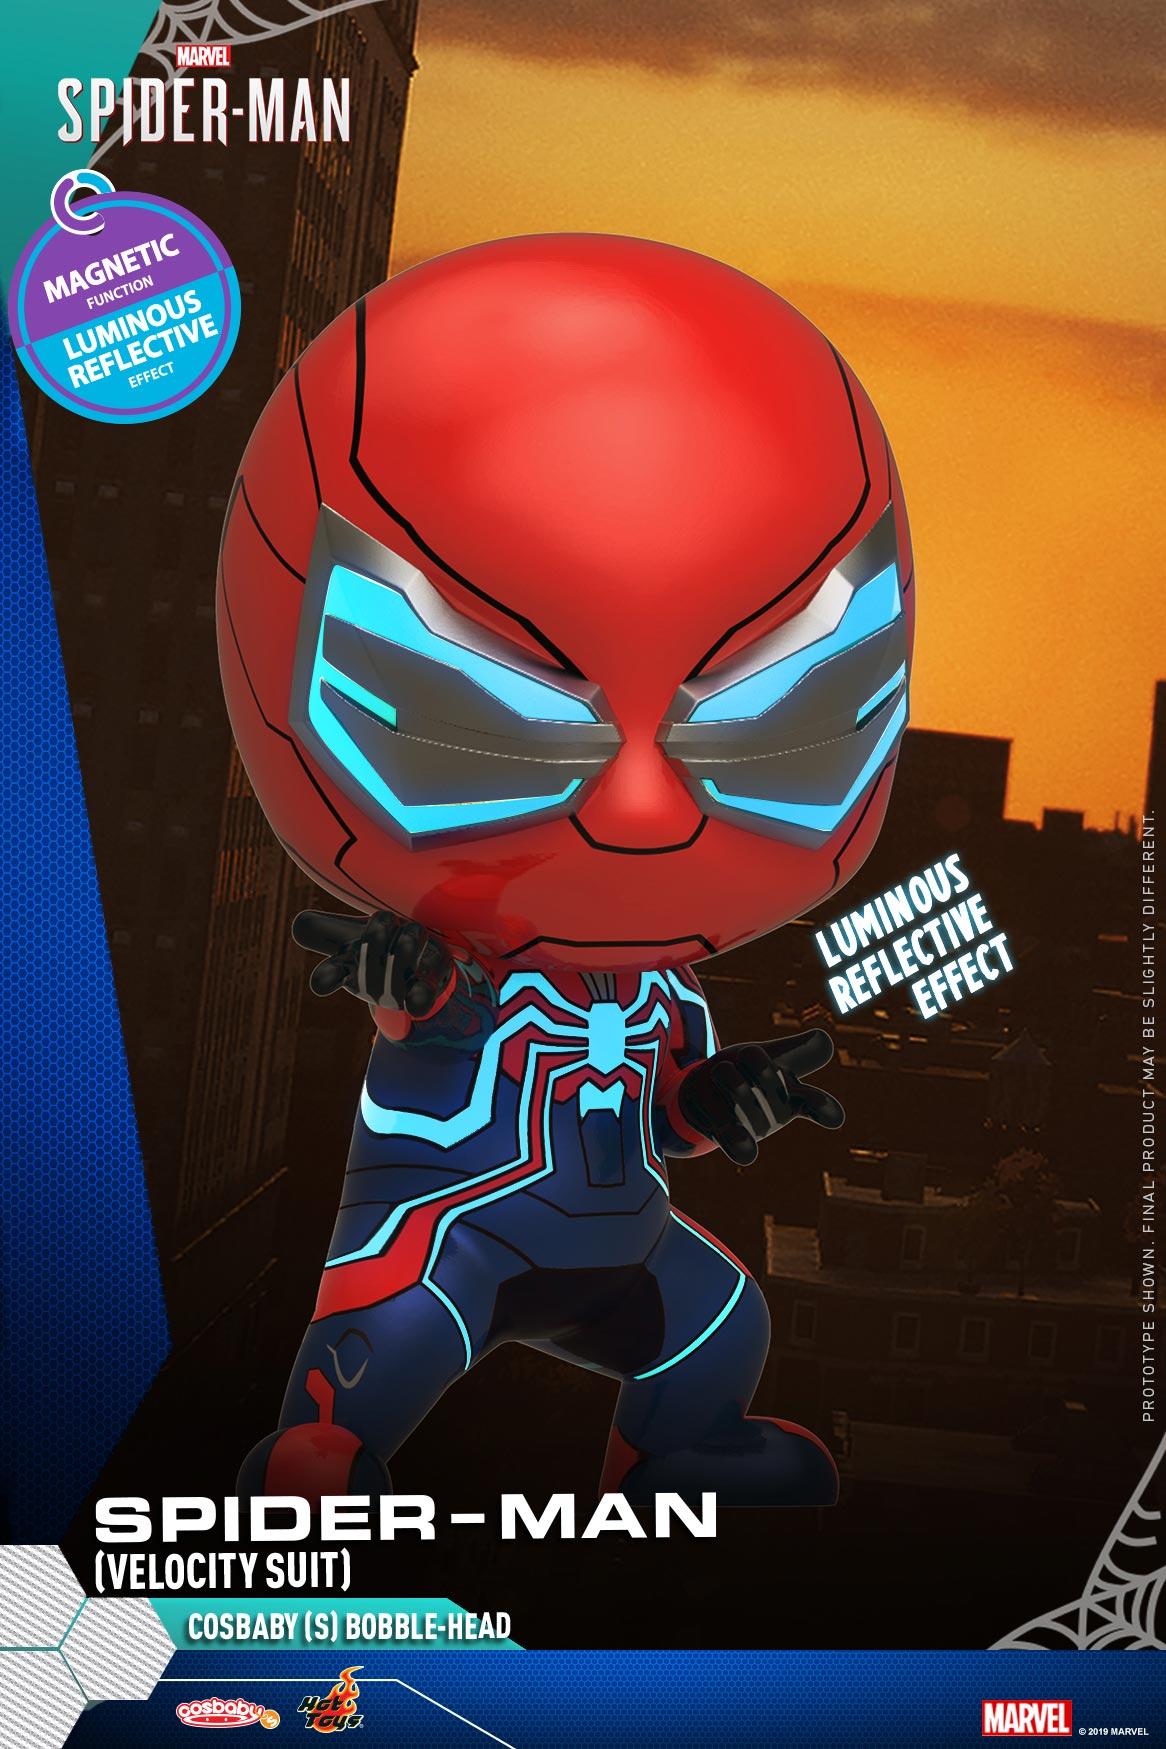 Hot-Toys---Marvel-Spider-Man---Spider-Man-(Velocity-Suit)-Cosbaby-(S)_PR2